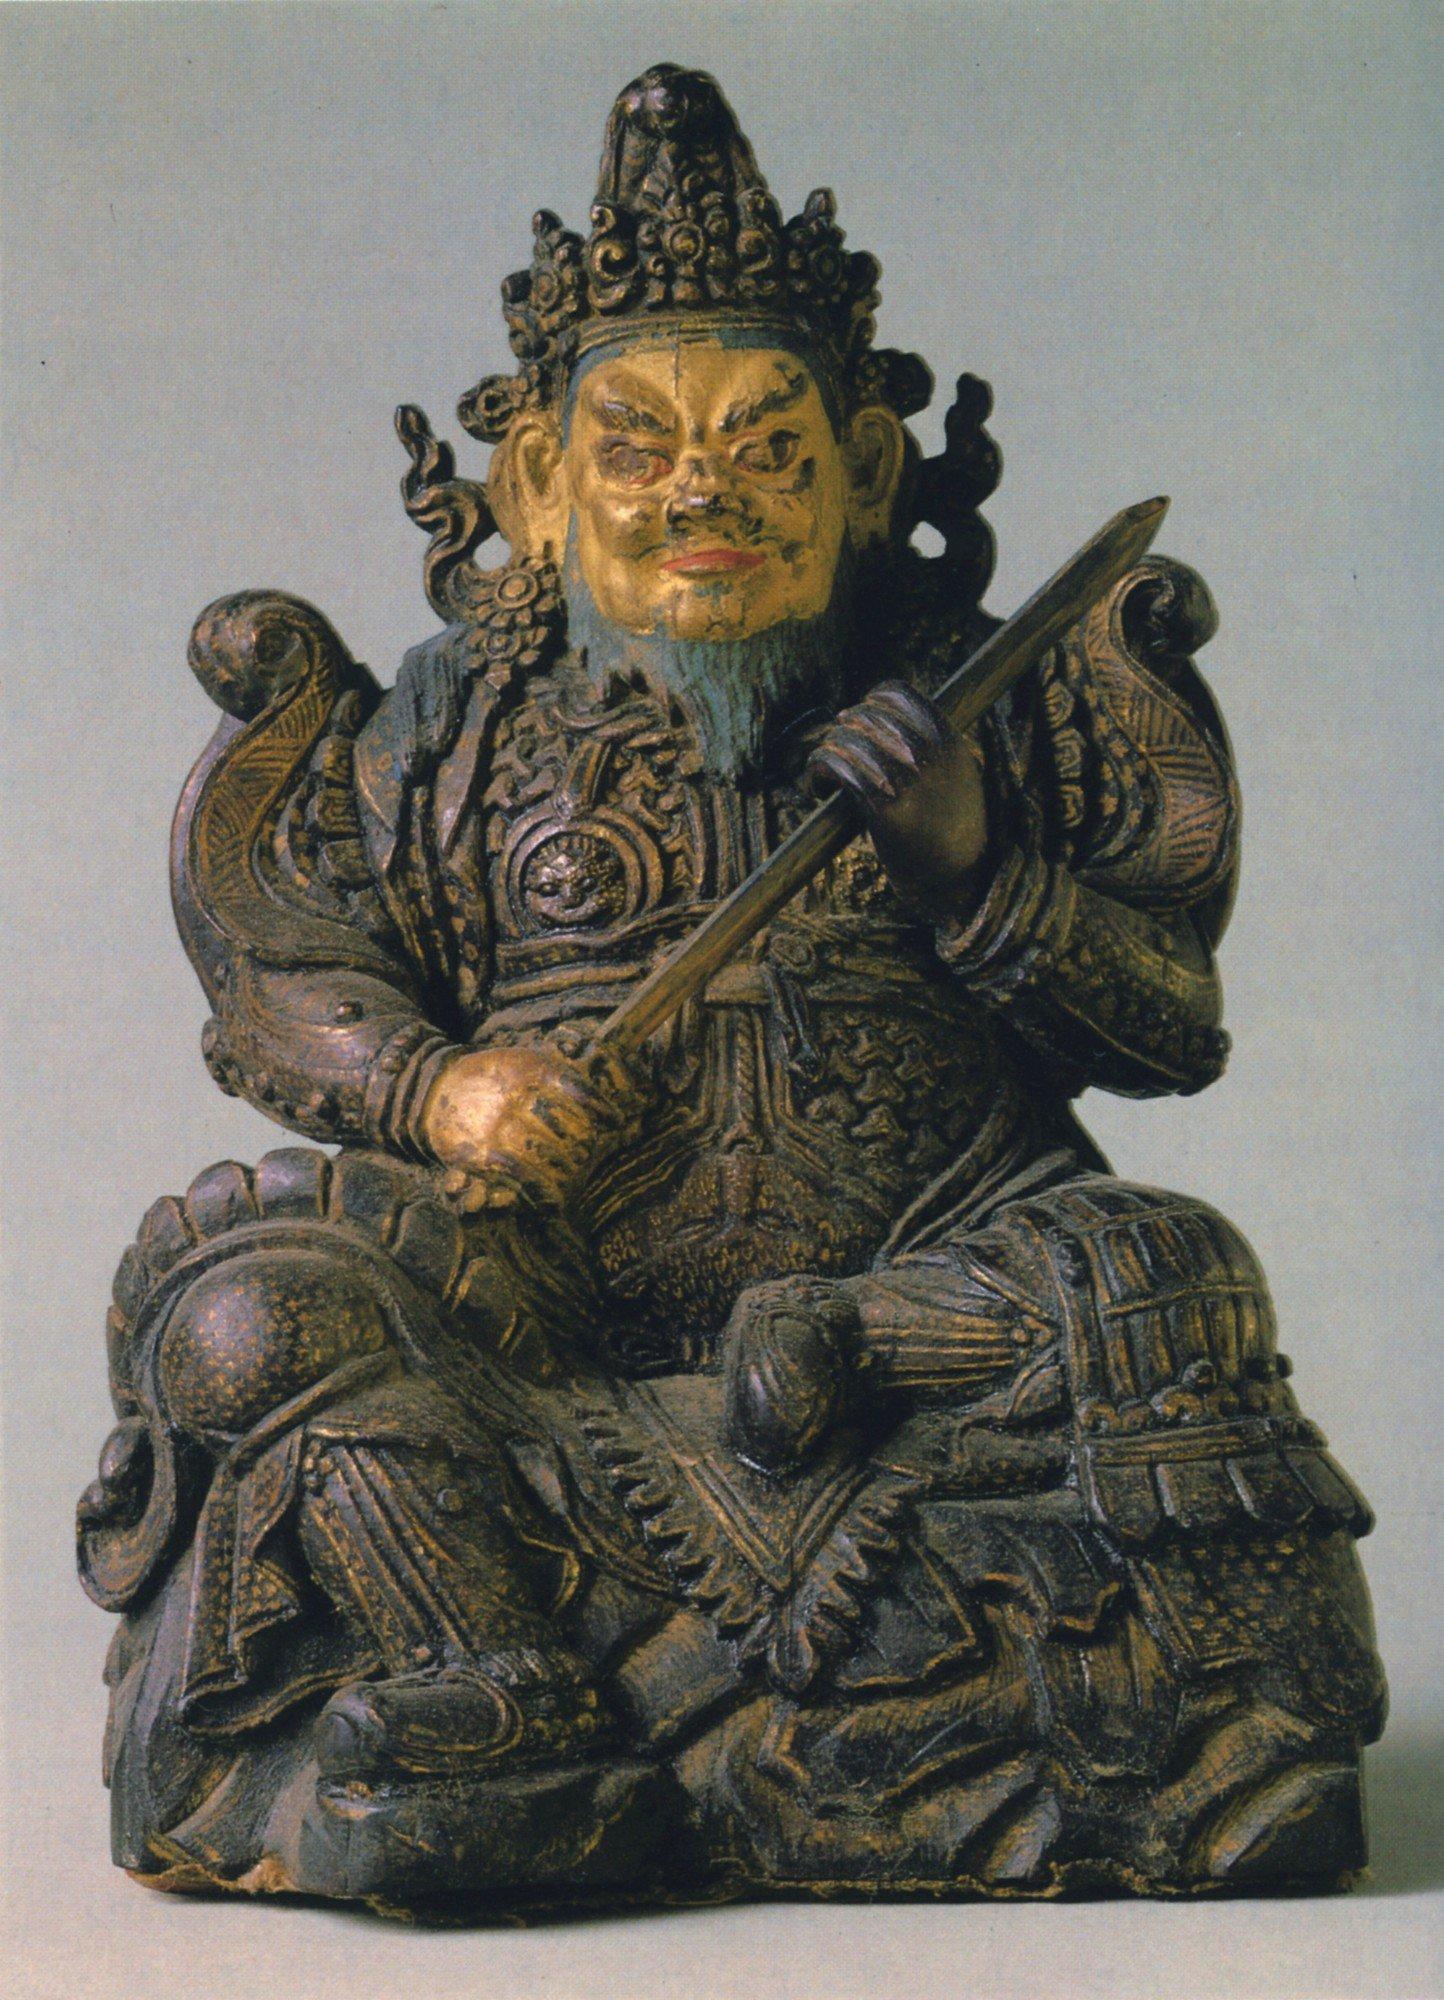 Old statue of virudhaka